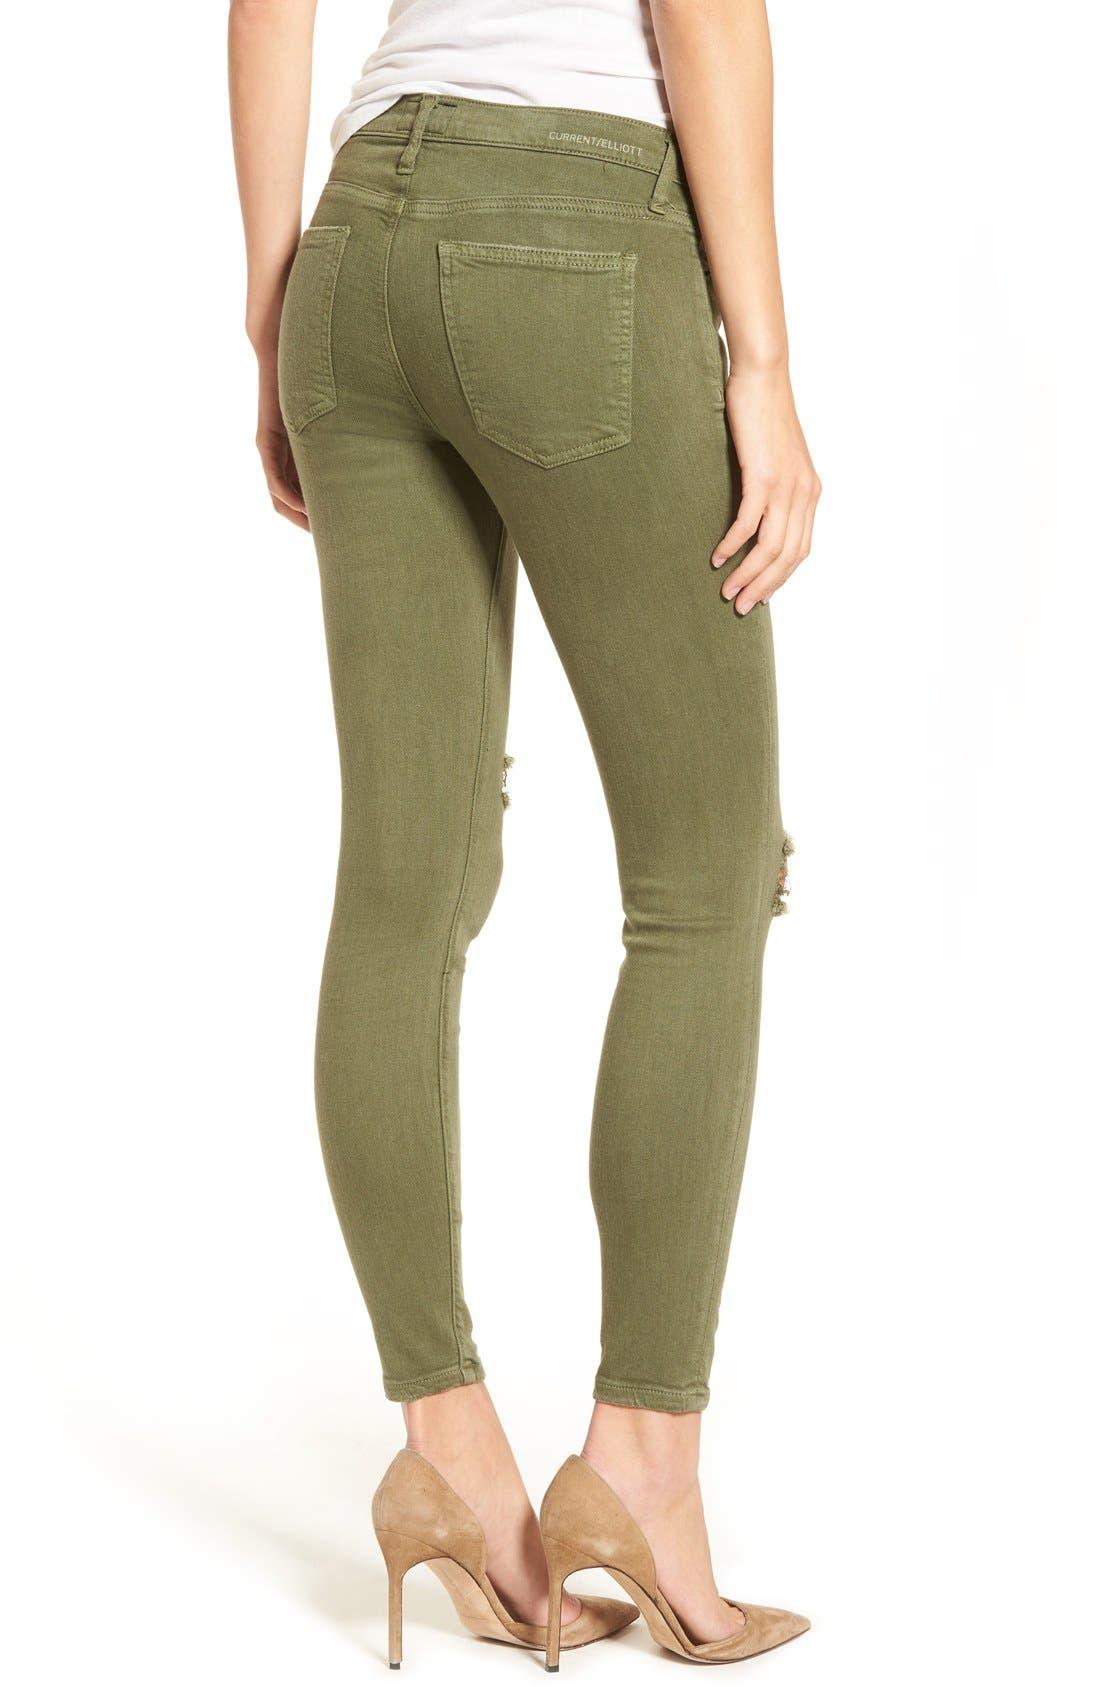 Alternate Image 2  - Current/Elliott 'The Stiletto' Crop Skinny Jeans